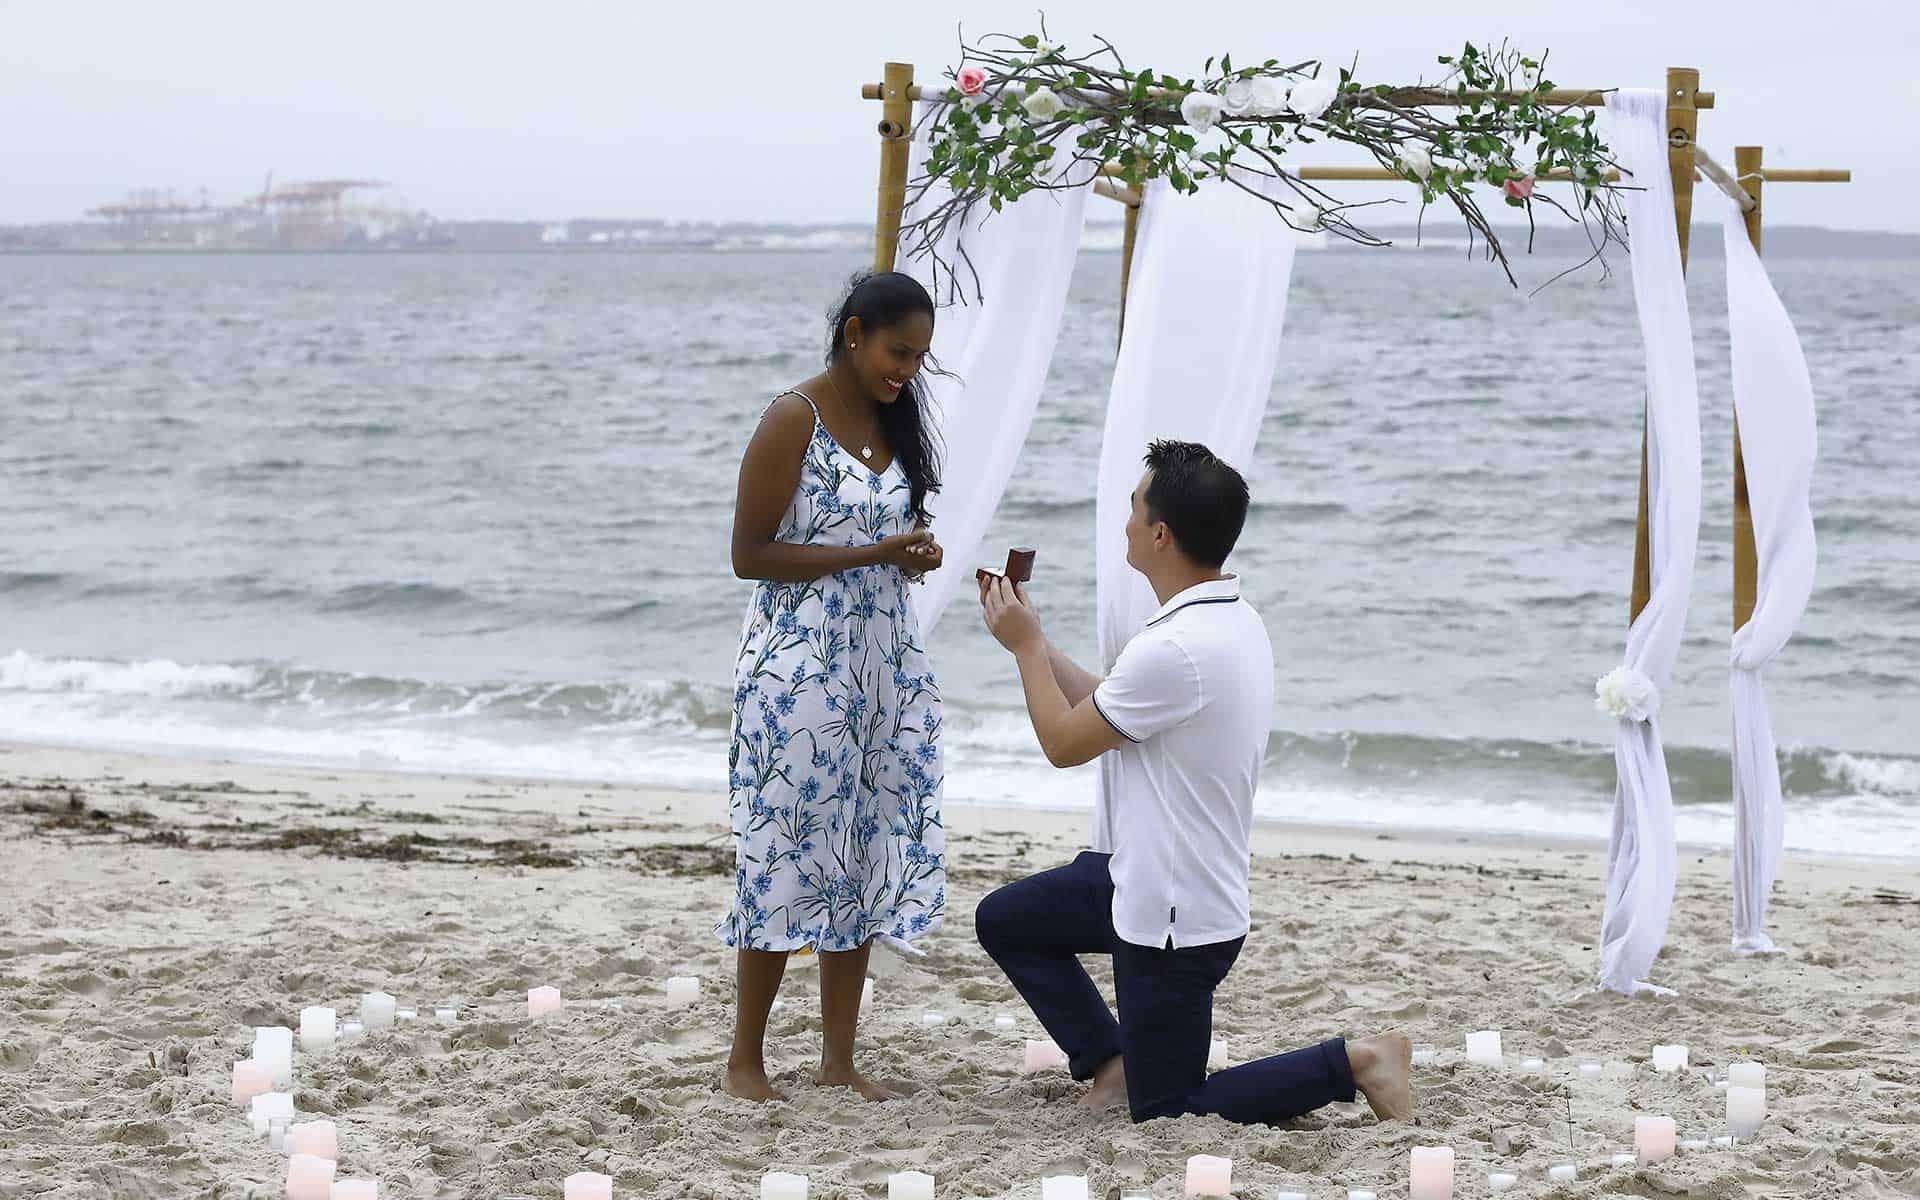 Engagement party photographer Sydney